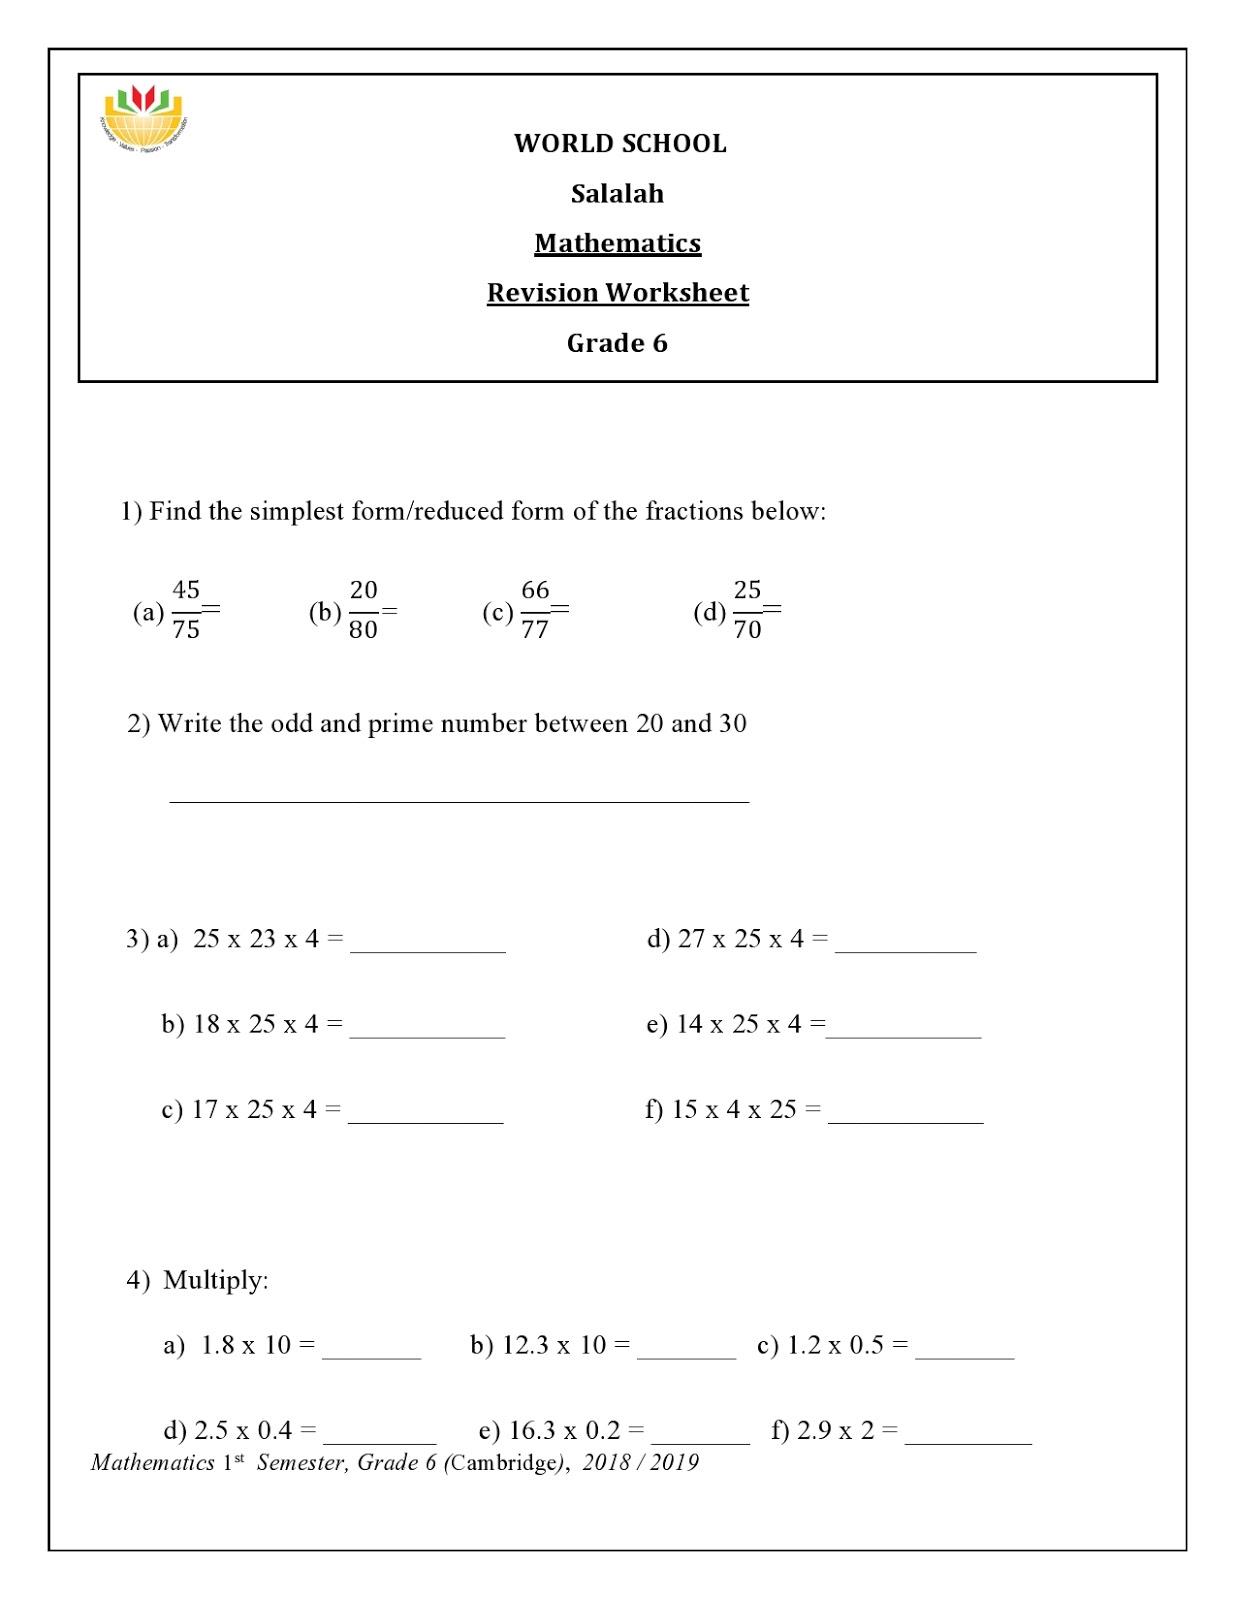 Birla World School Oman: Math Revision for Grade 6 as on 03-01-2019